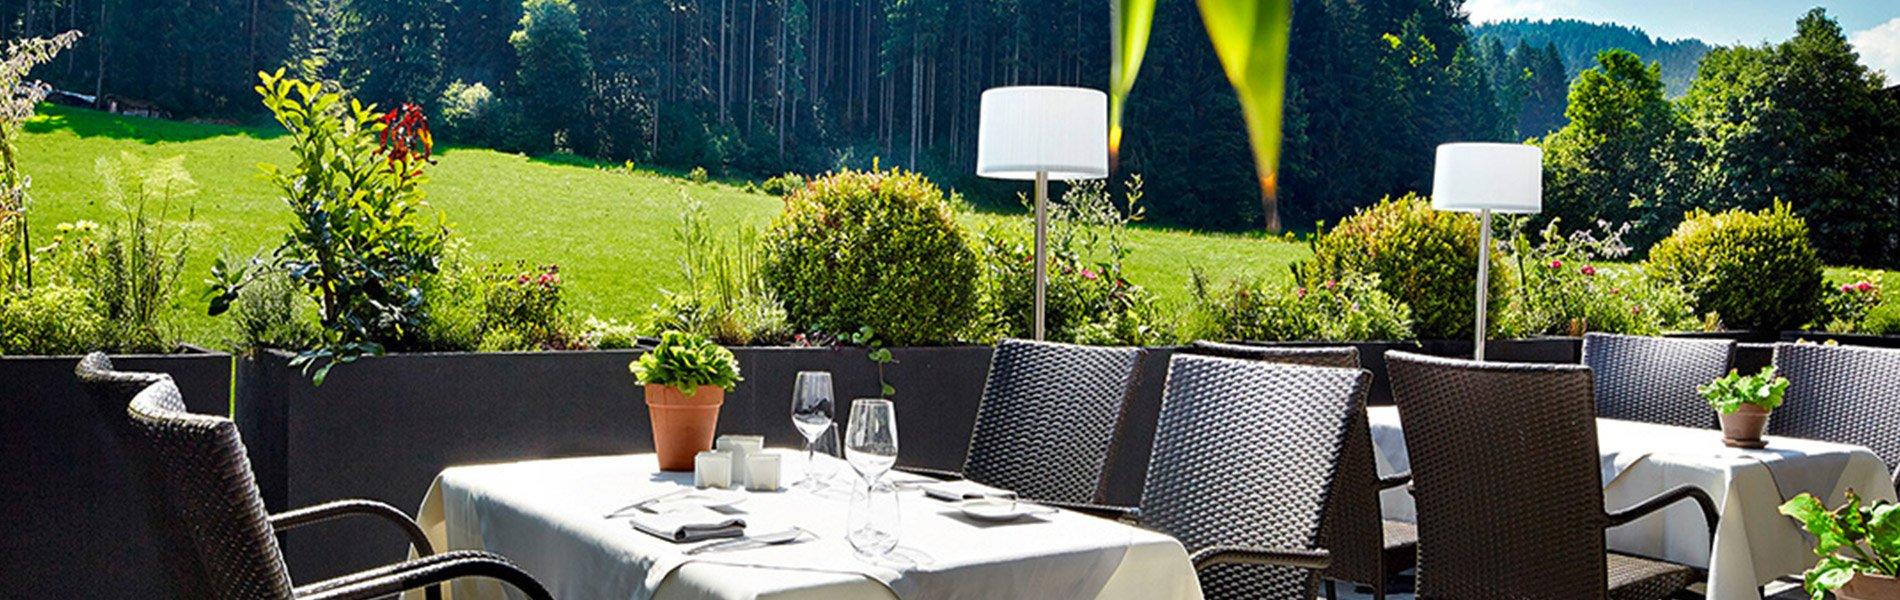 Relais Chateaux Hotel Restaurant Spa